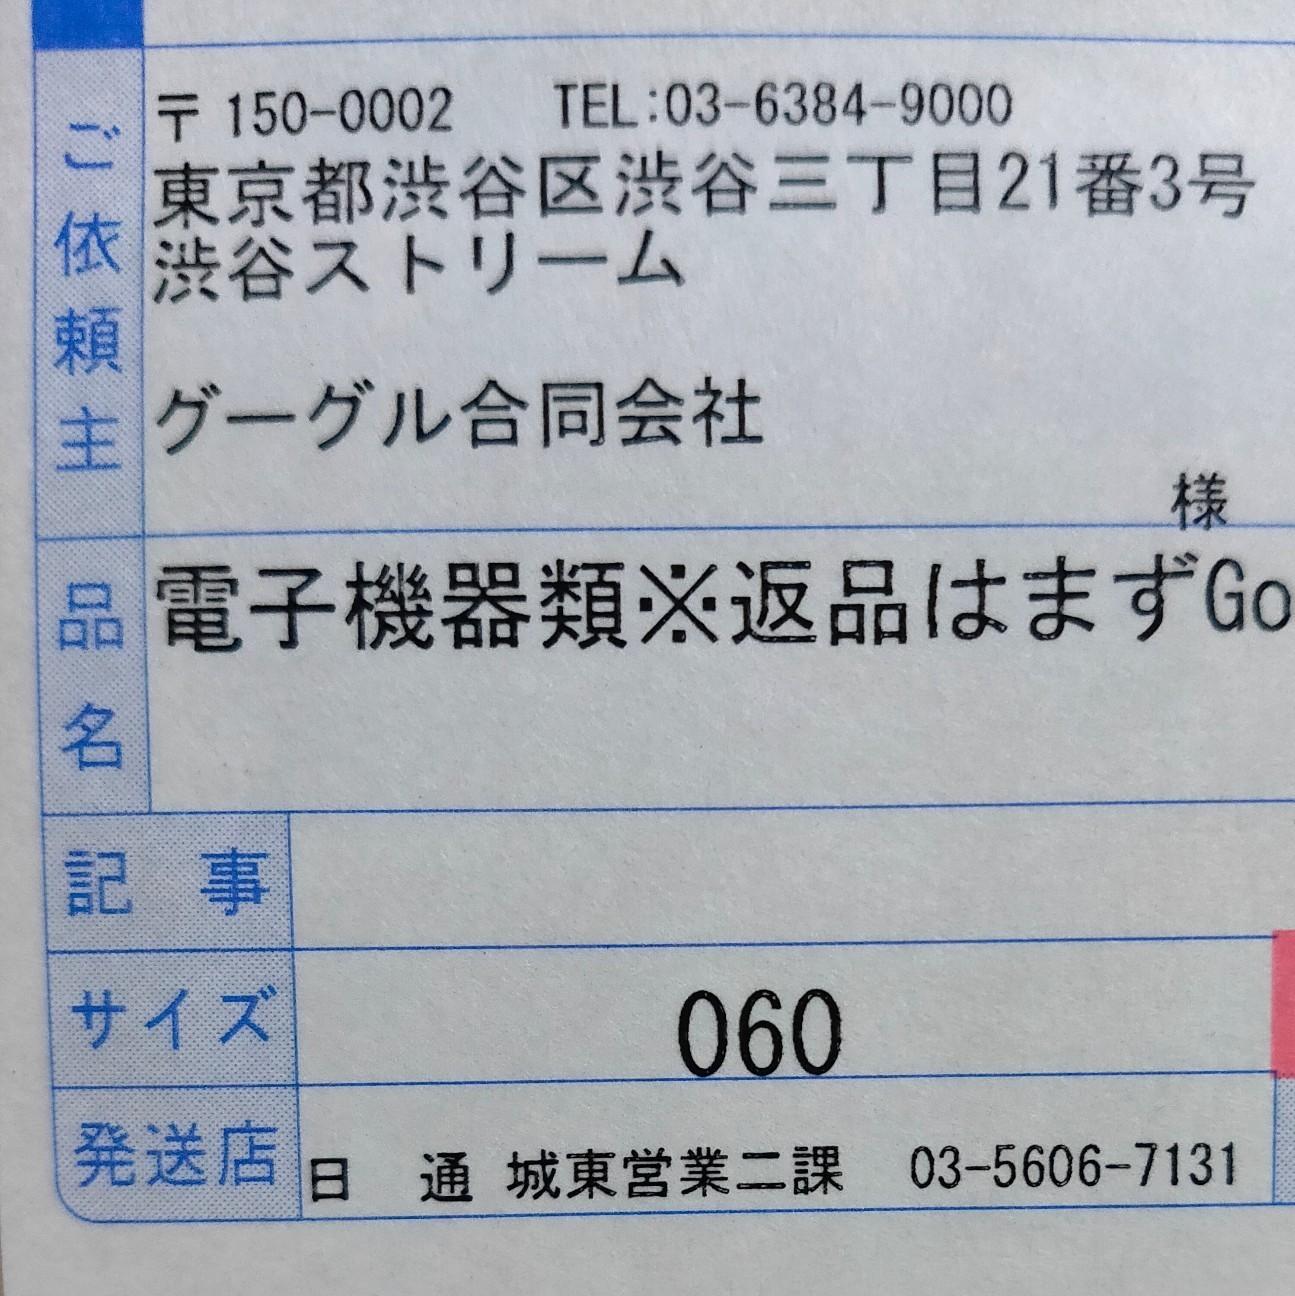 f:id:oic:20200820062540j:plain